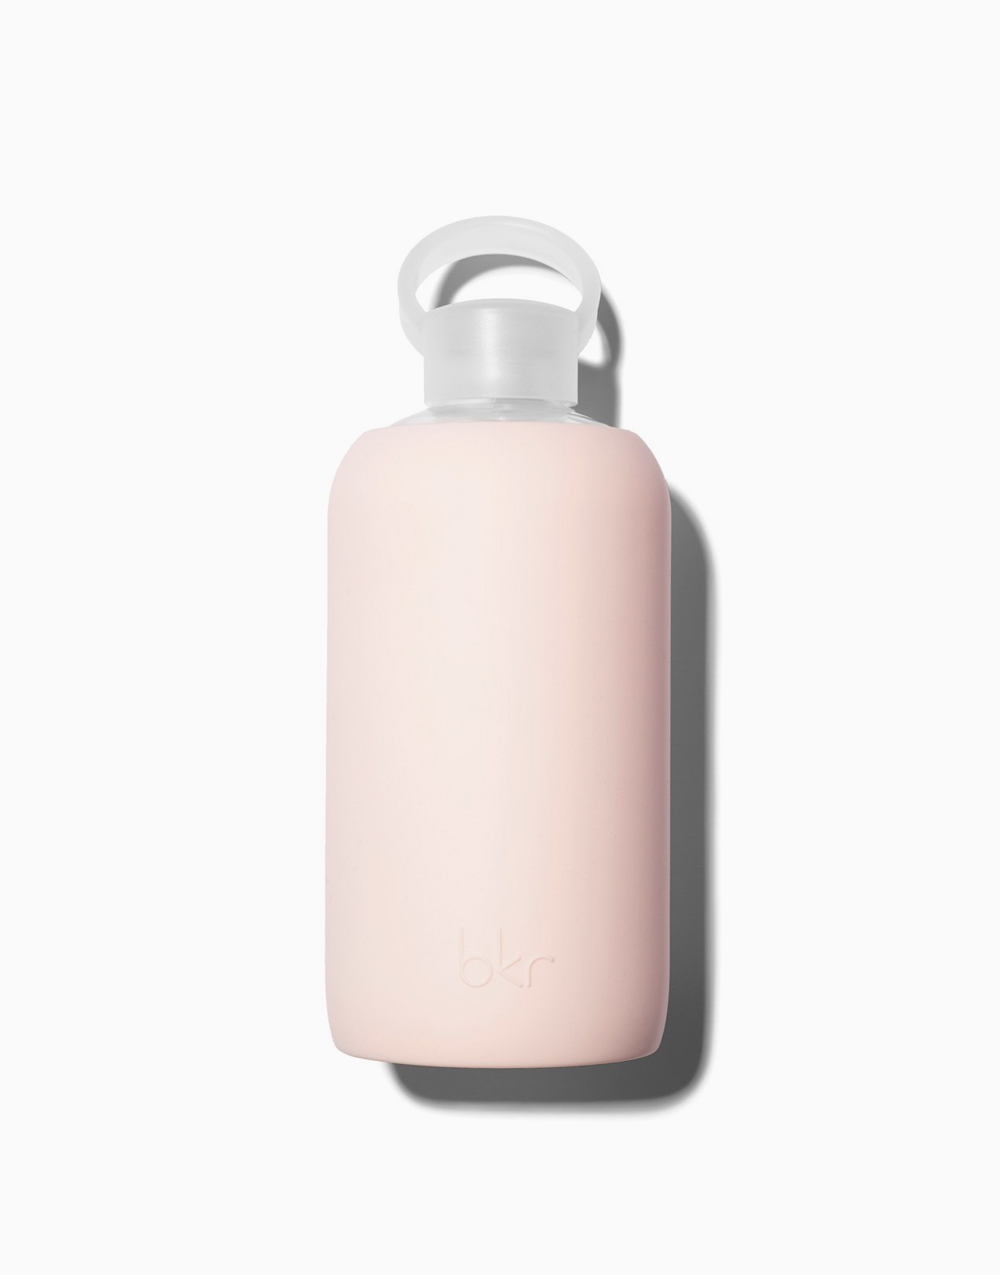 Big Water Bottle (1L) by Bkr | Tutu